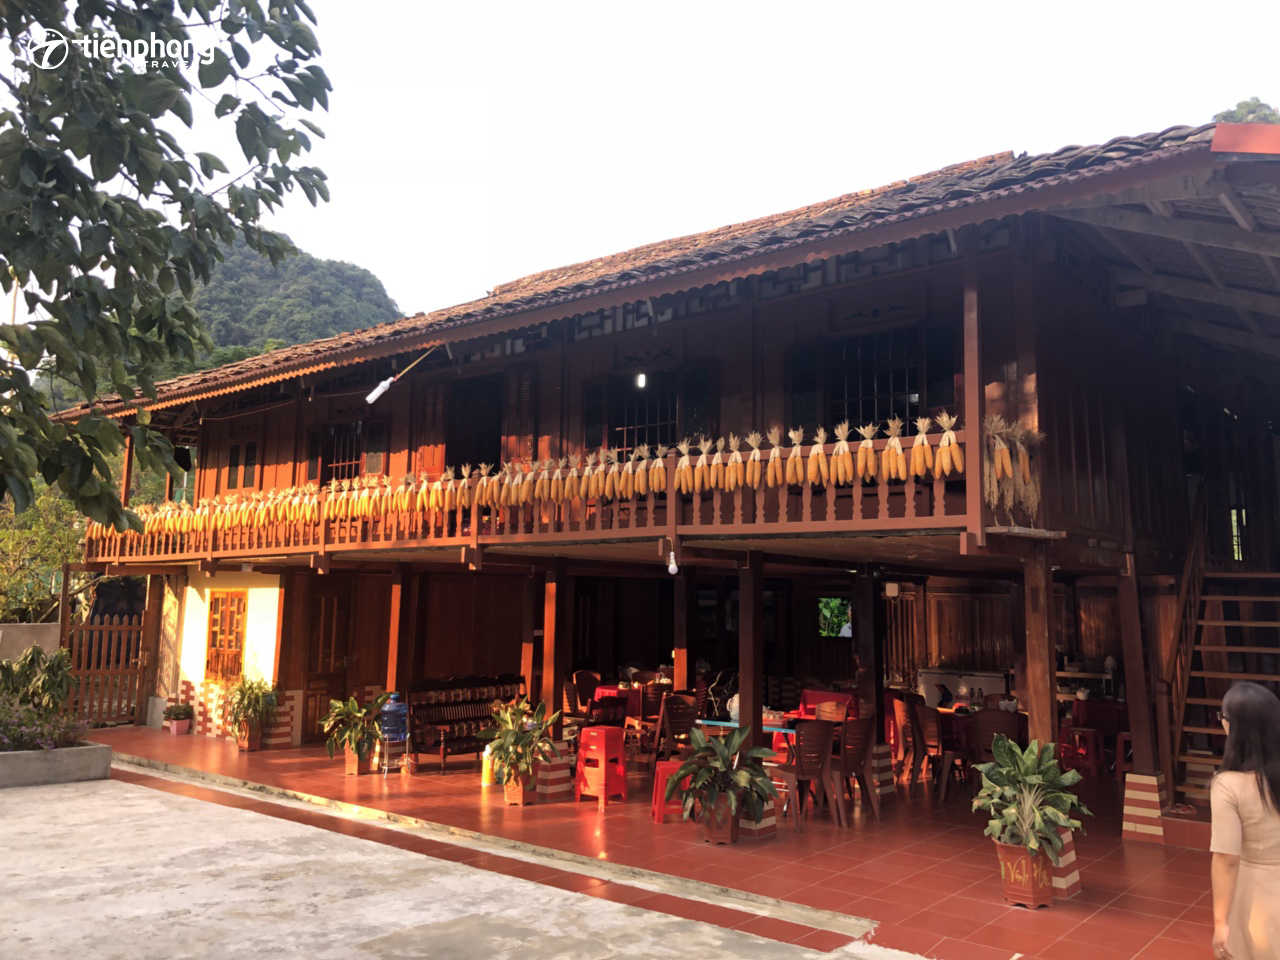 Tour du lịch Bắc Sơn